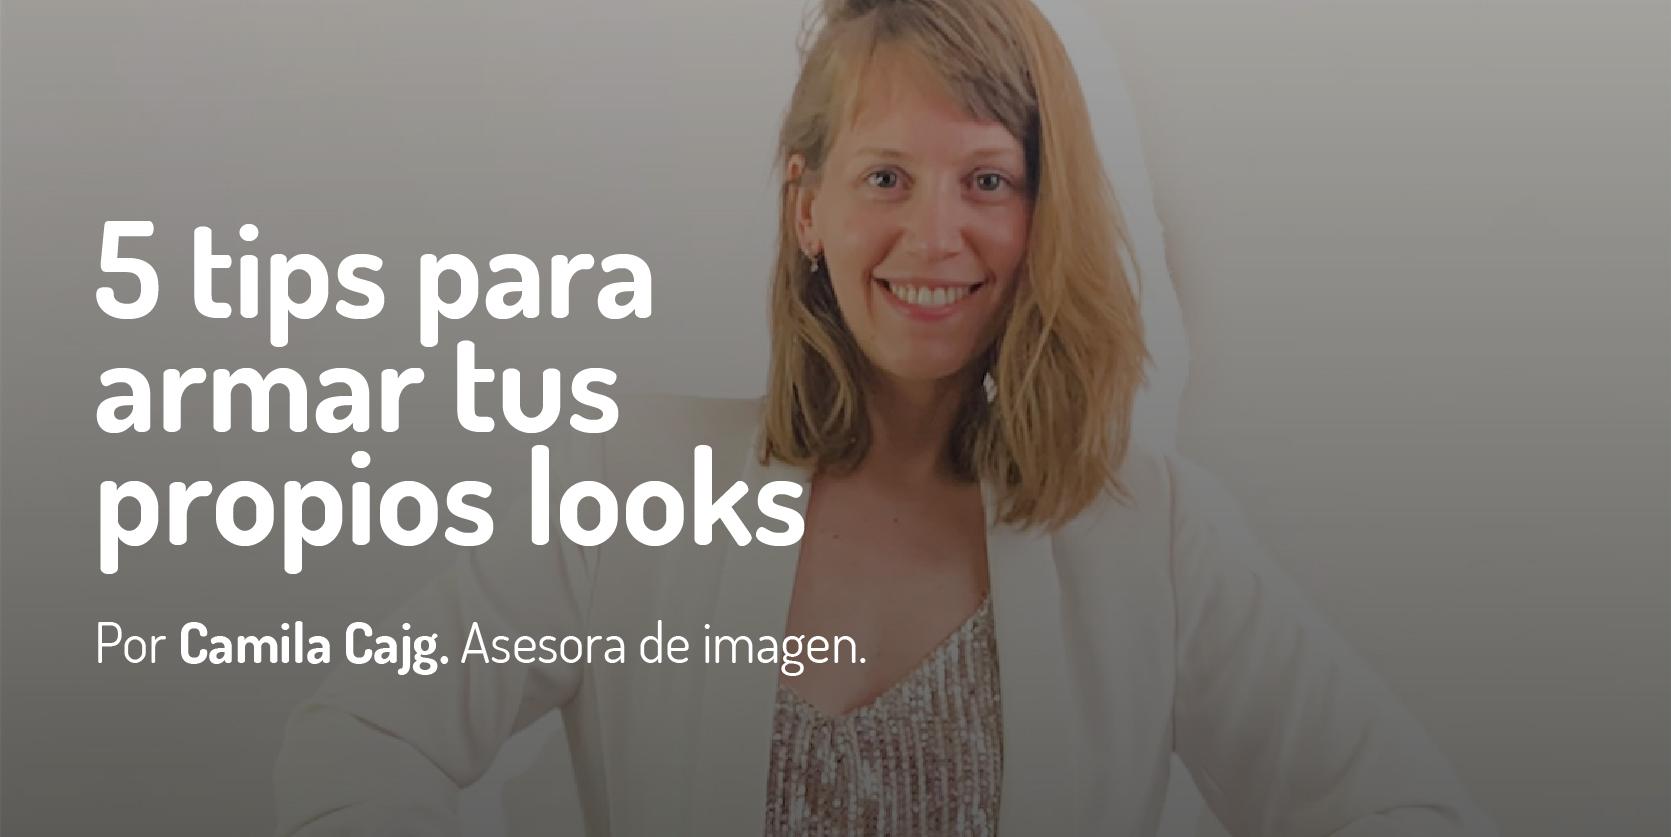 5 tips para armar tus propios looks